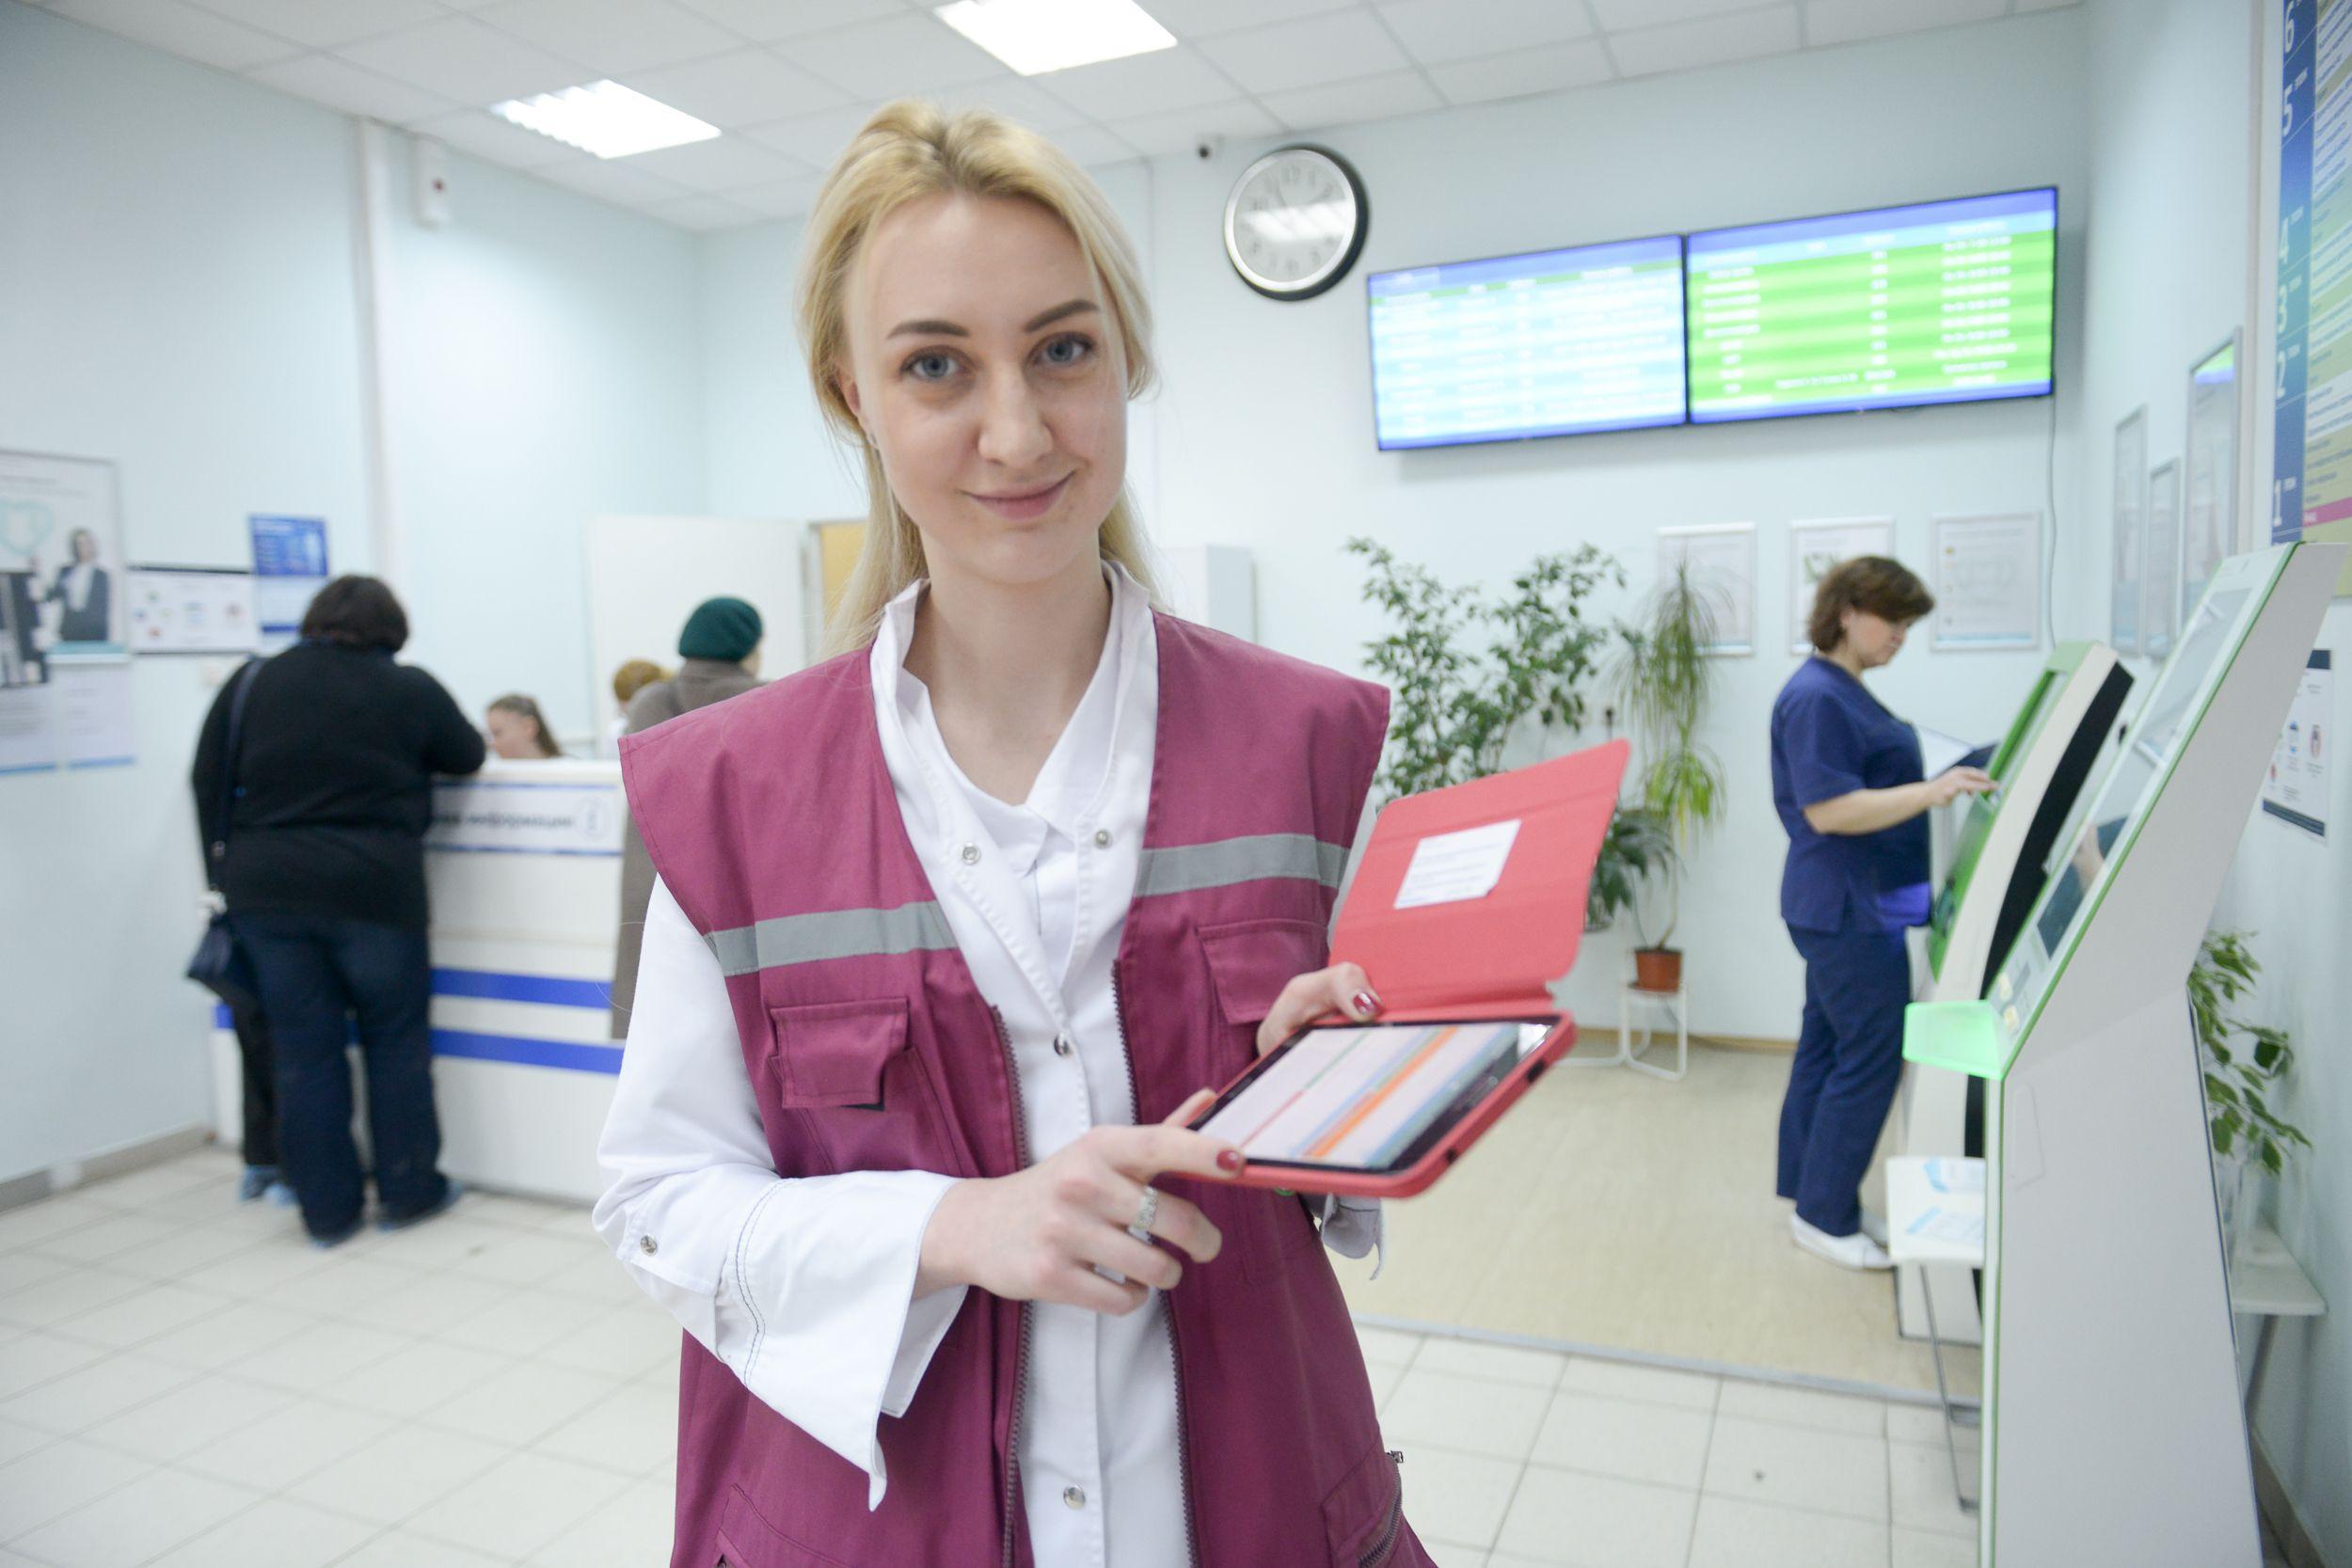 Москвичи оценят электронную медицинскую карту